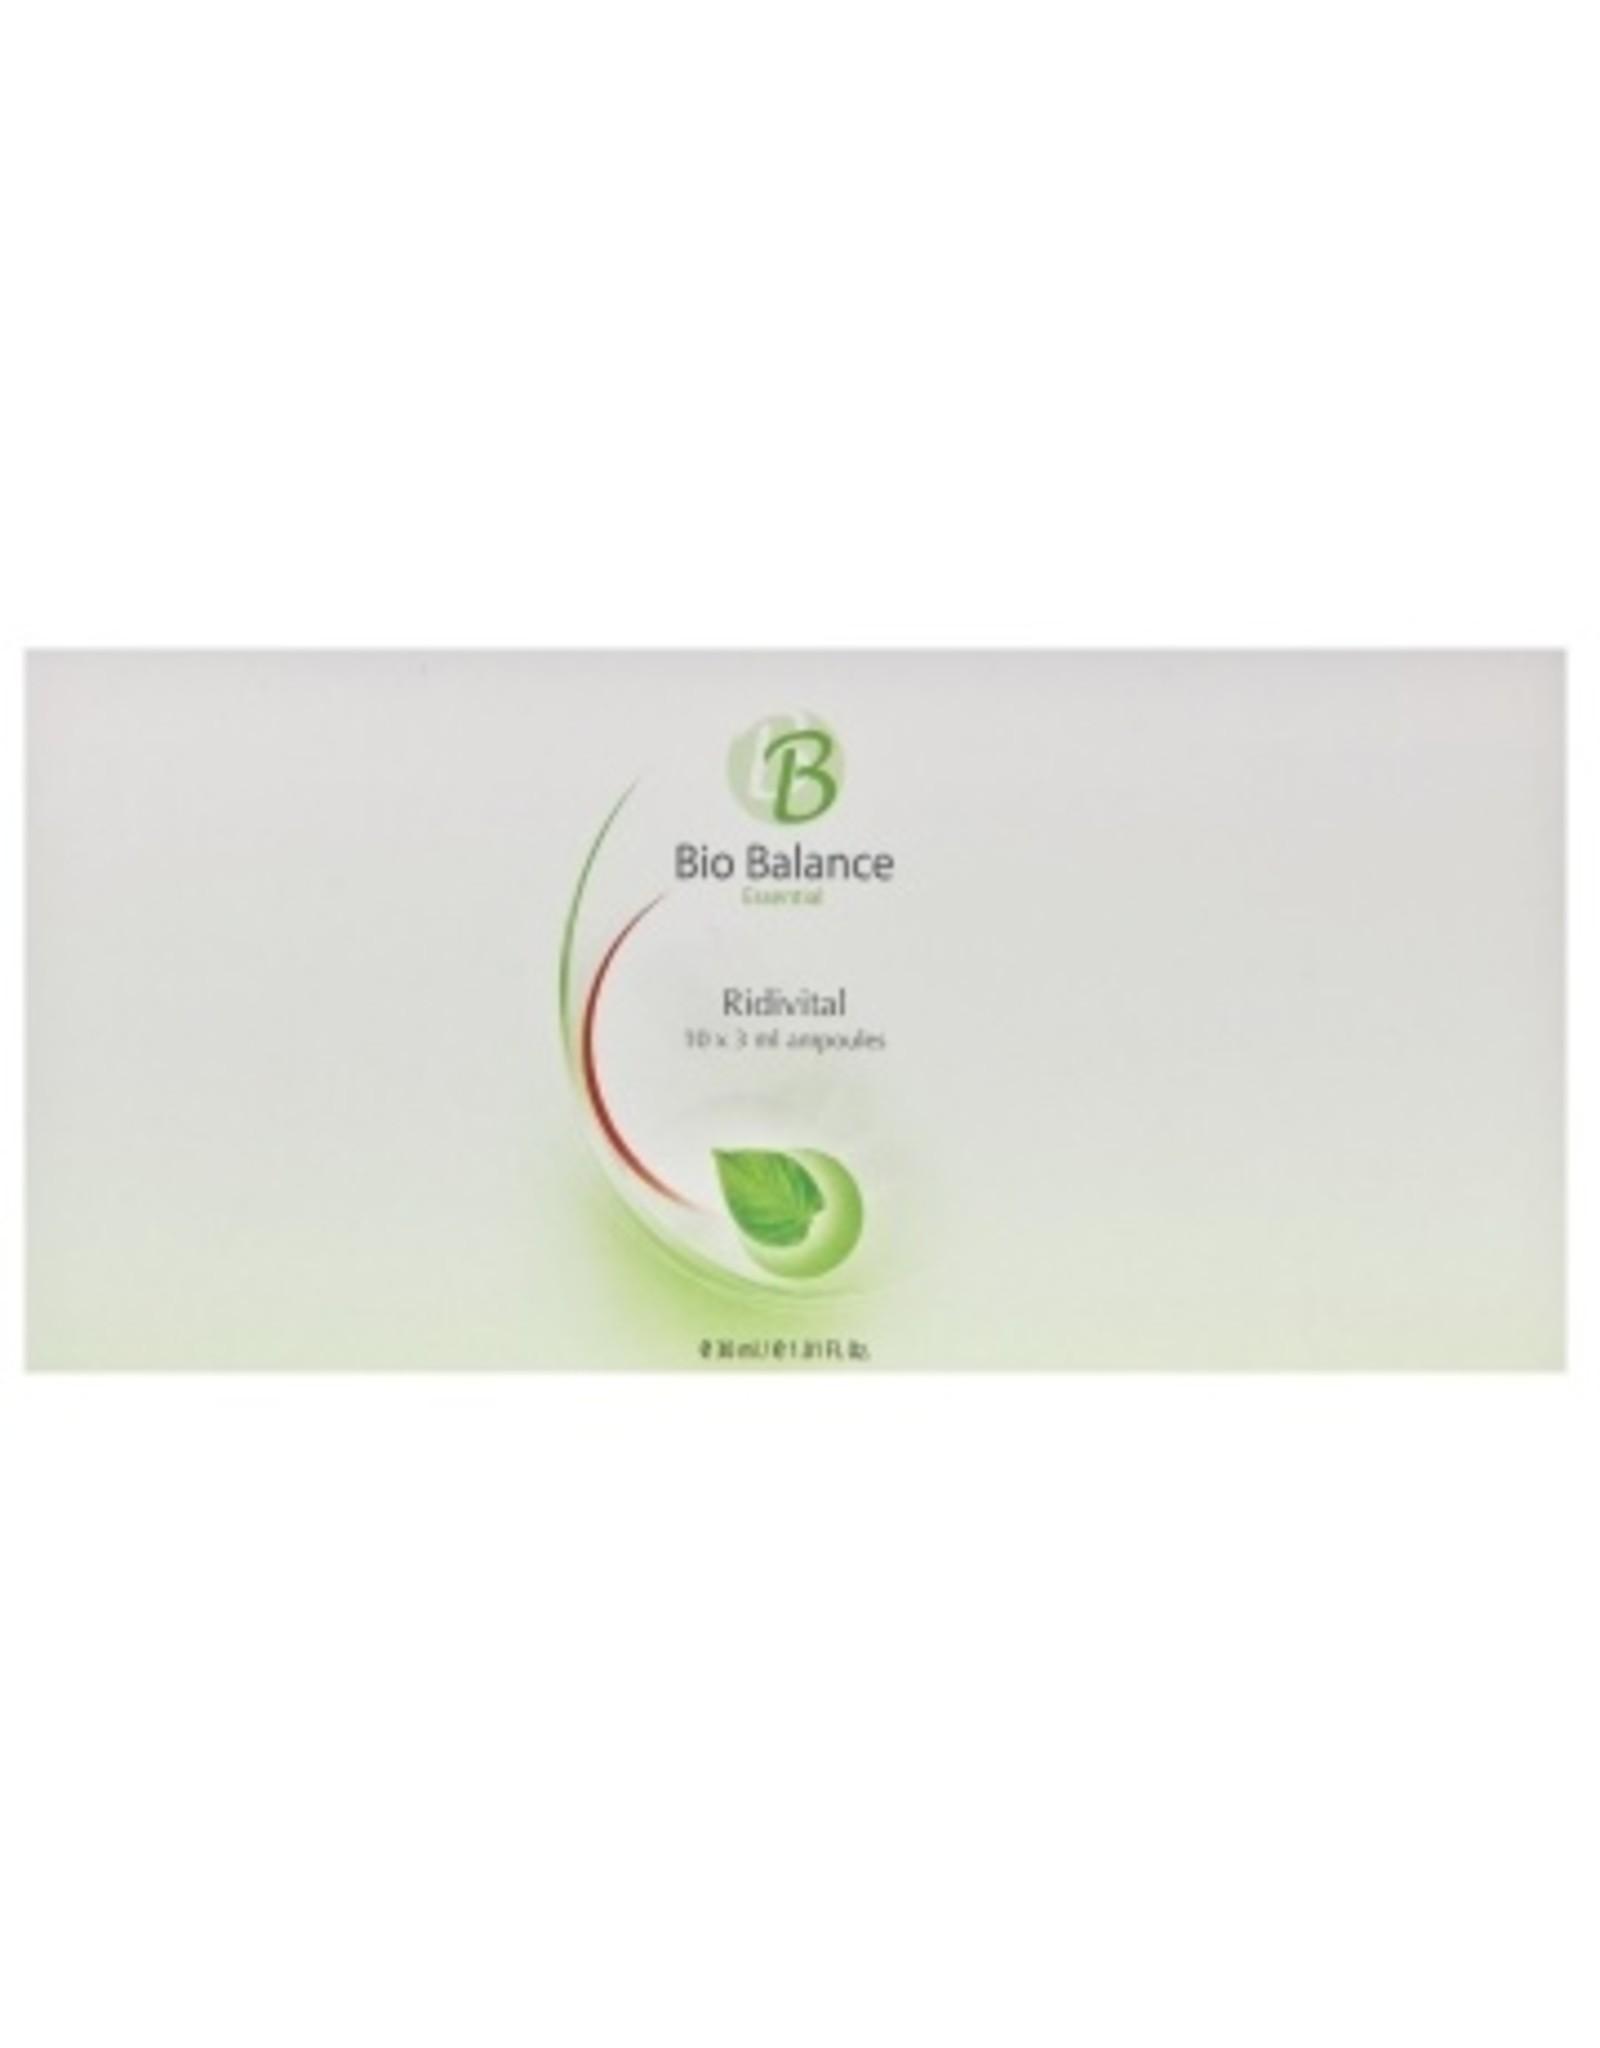 Bio Balance Ampullen  Ridivital - Bio Balance